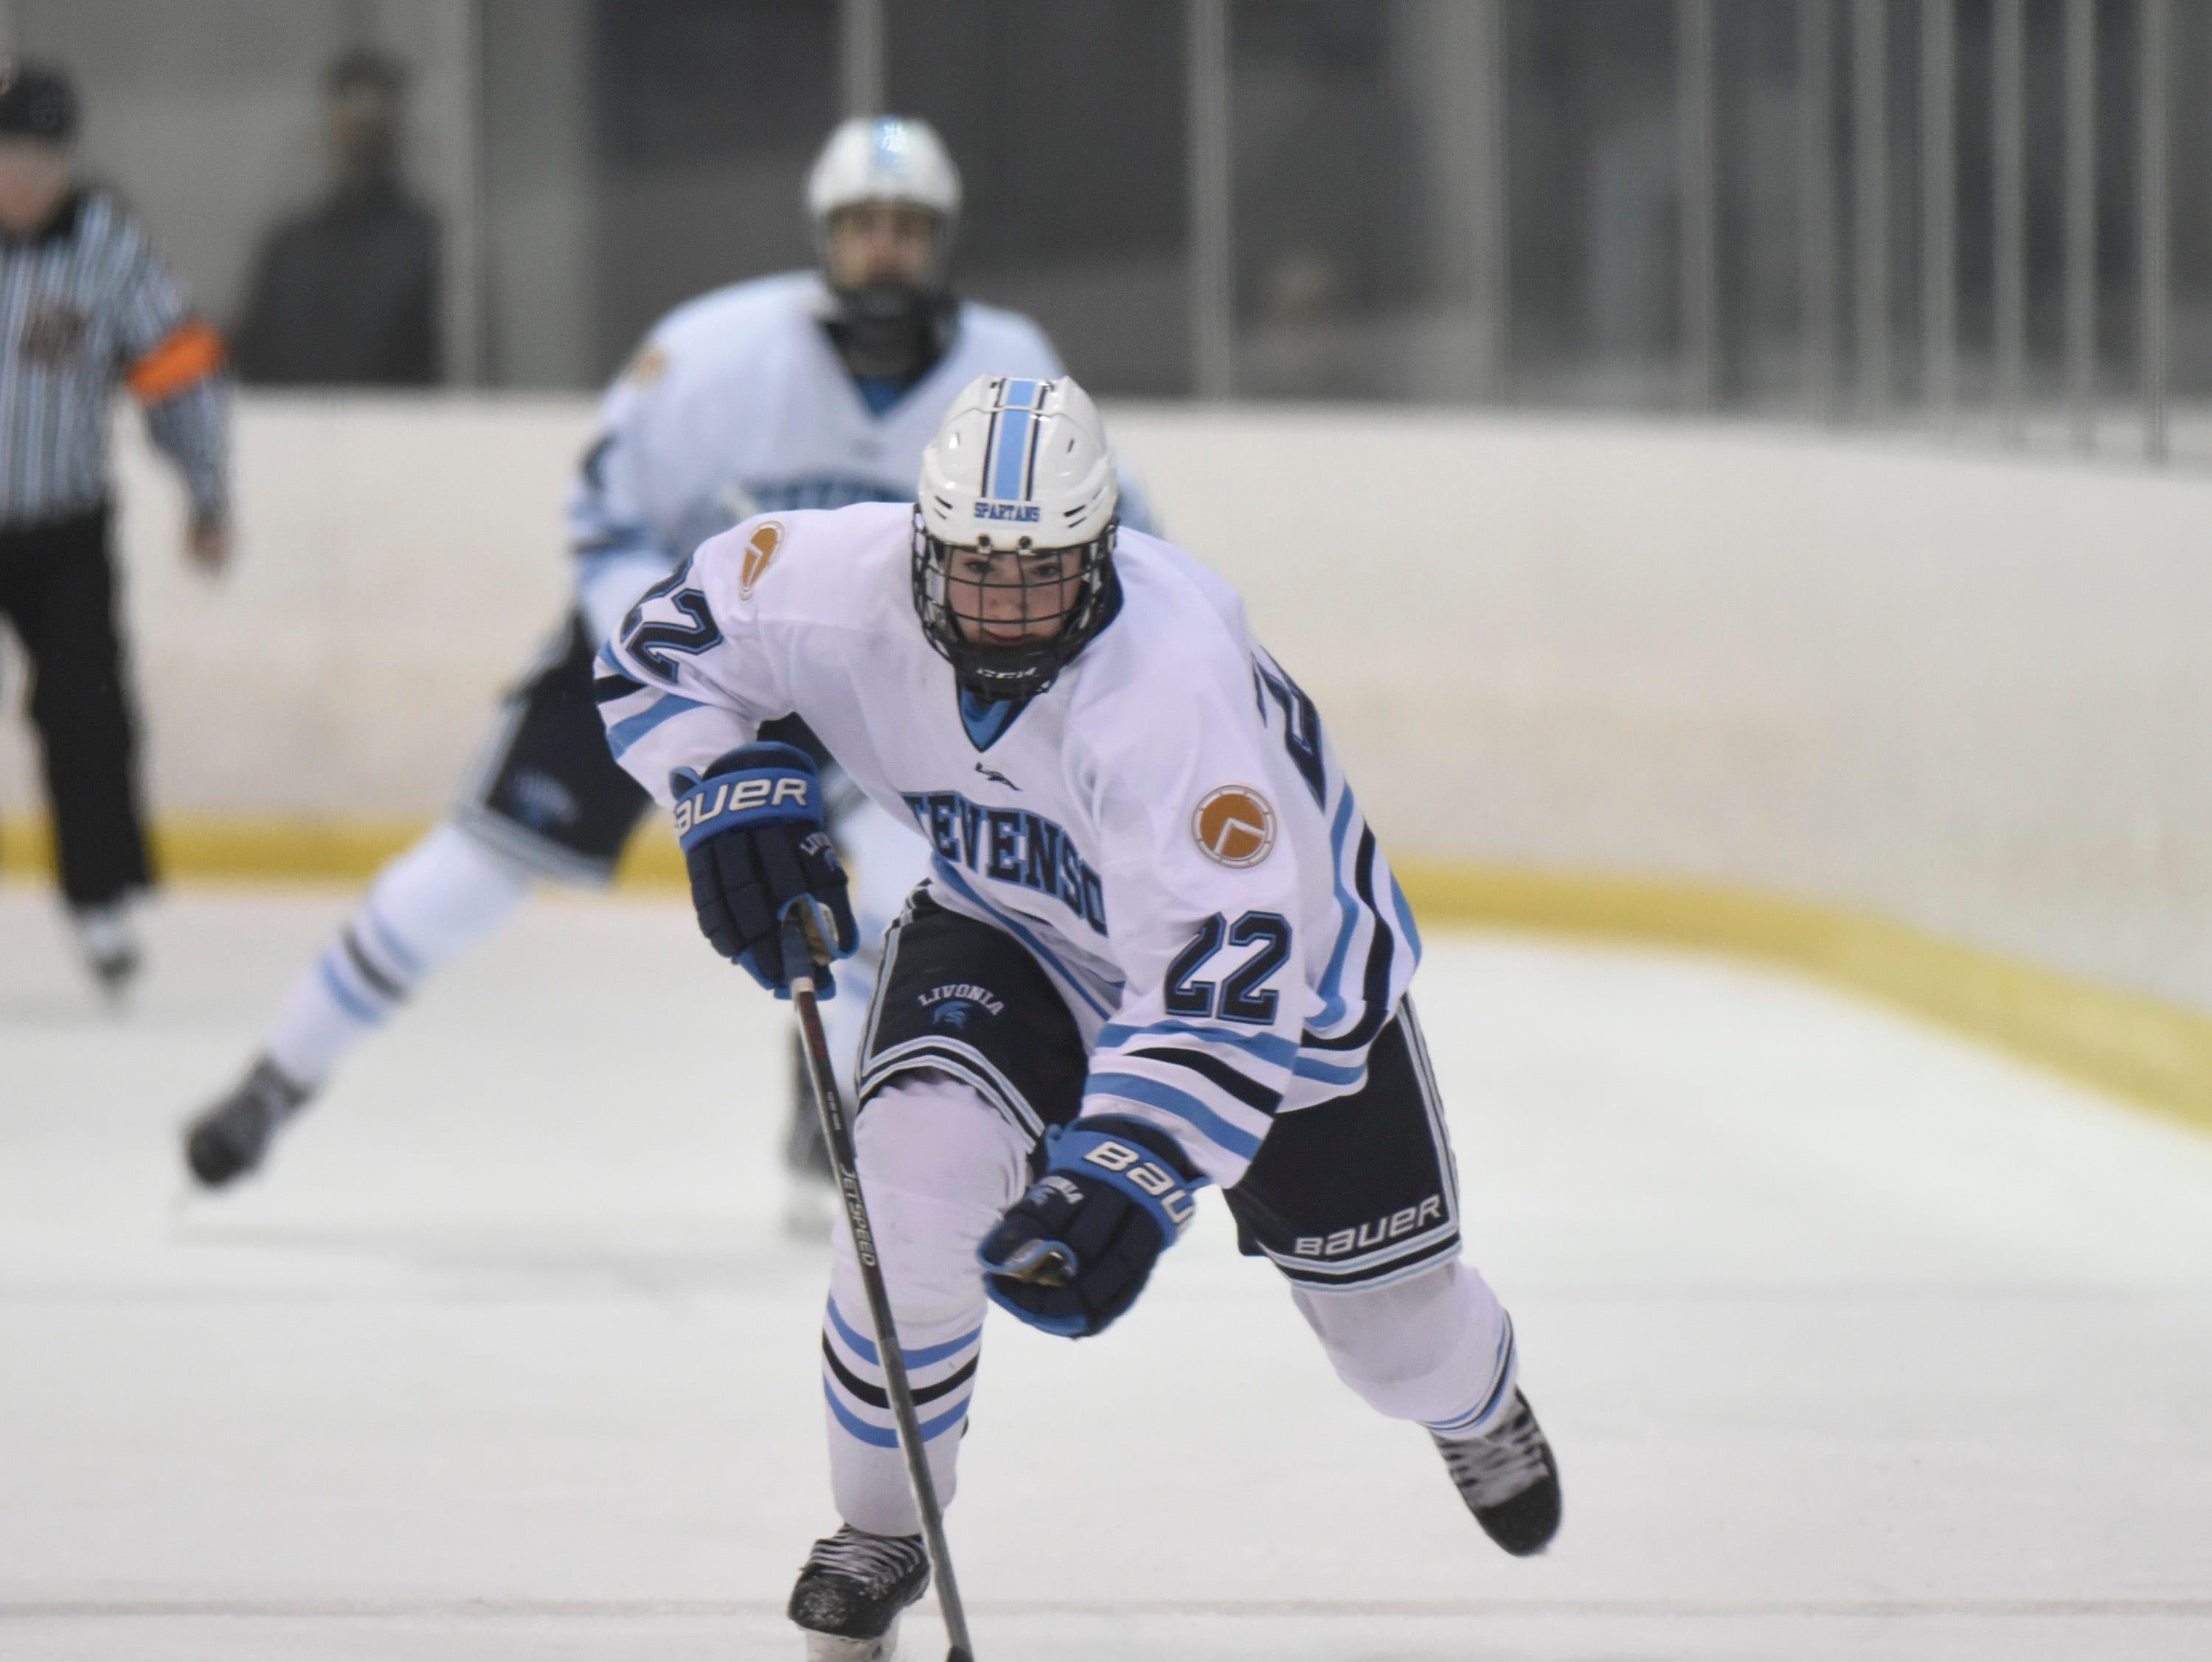 Stevenson forward Kosh Suzio (22) moves the puck up ice against Salem at Eddie Edgar Arena Jan. 4, 2019.